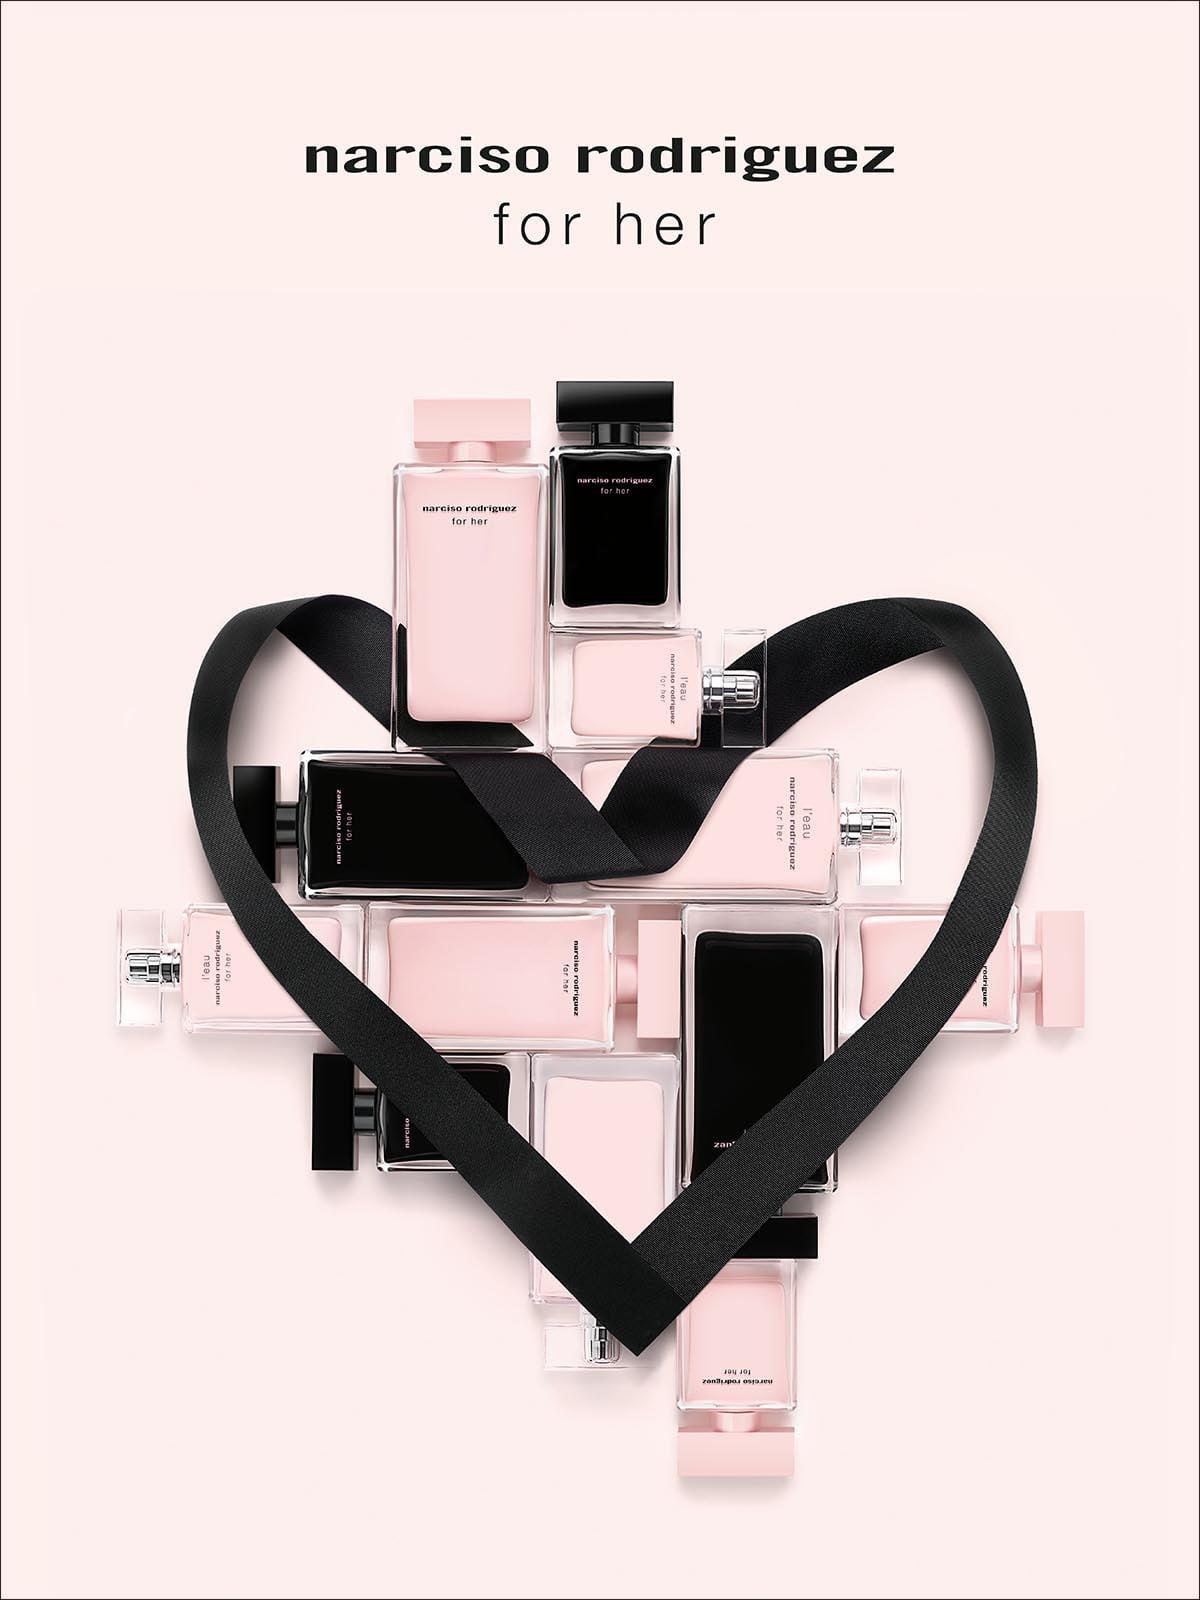 San Valentino 2015 Narciso Rodriguez For Her Eau De Parfum